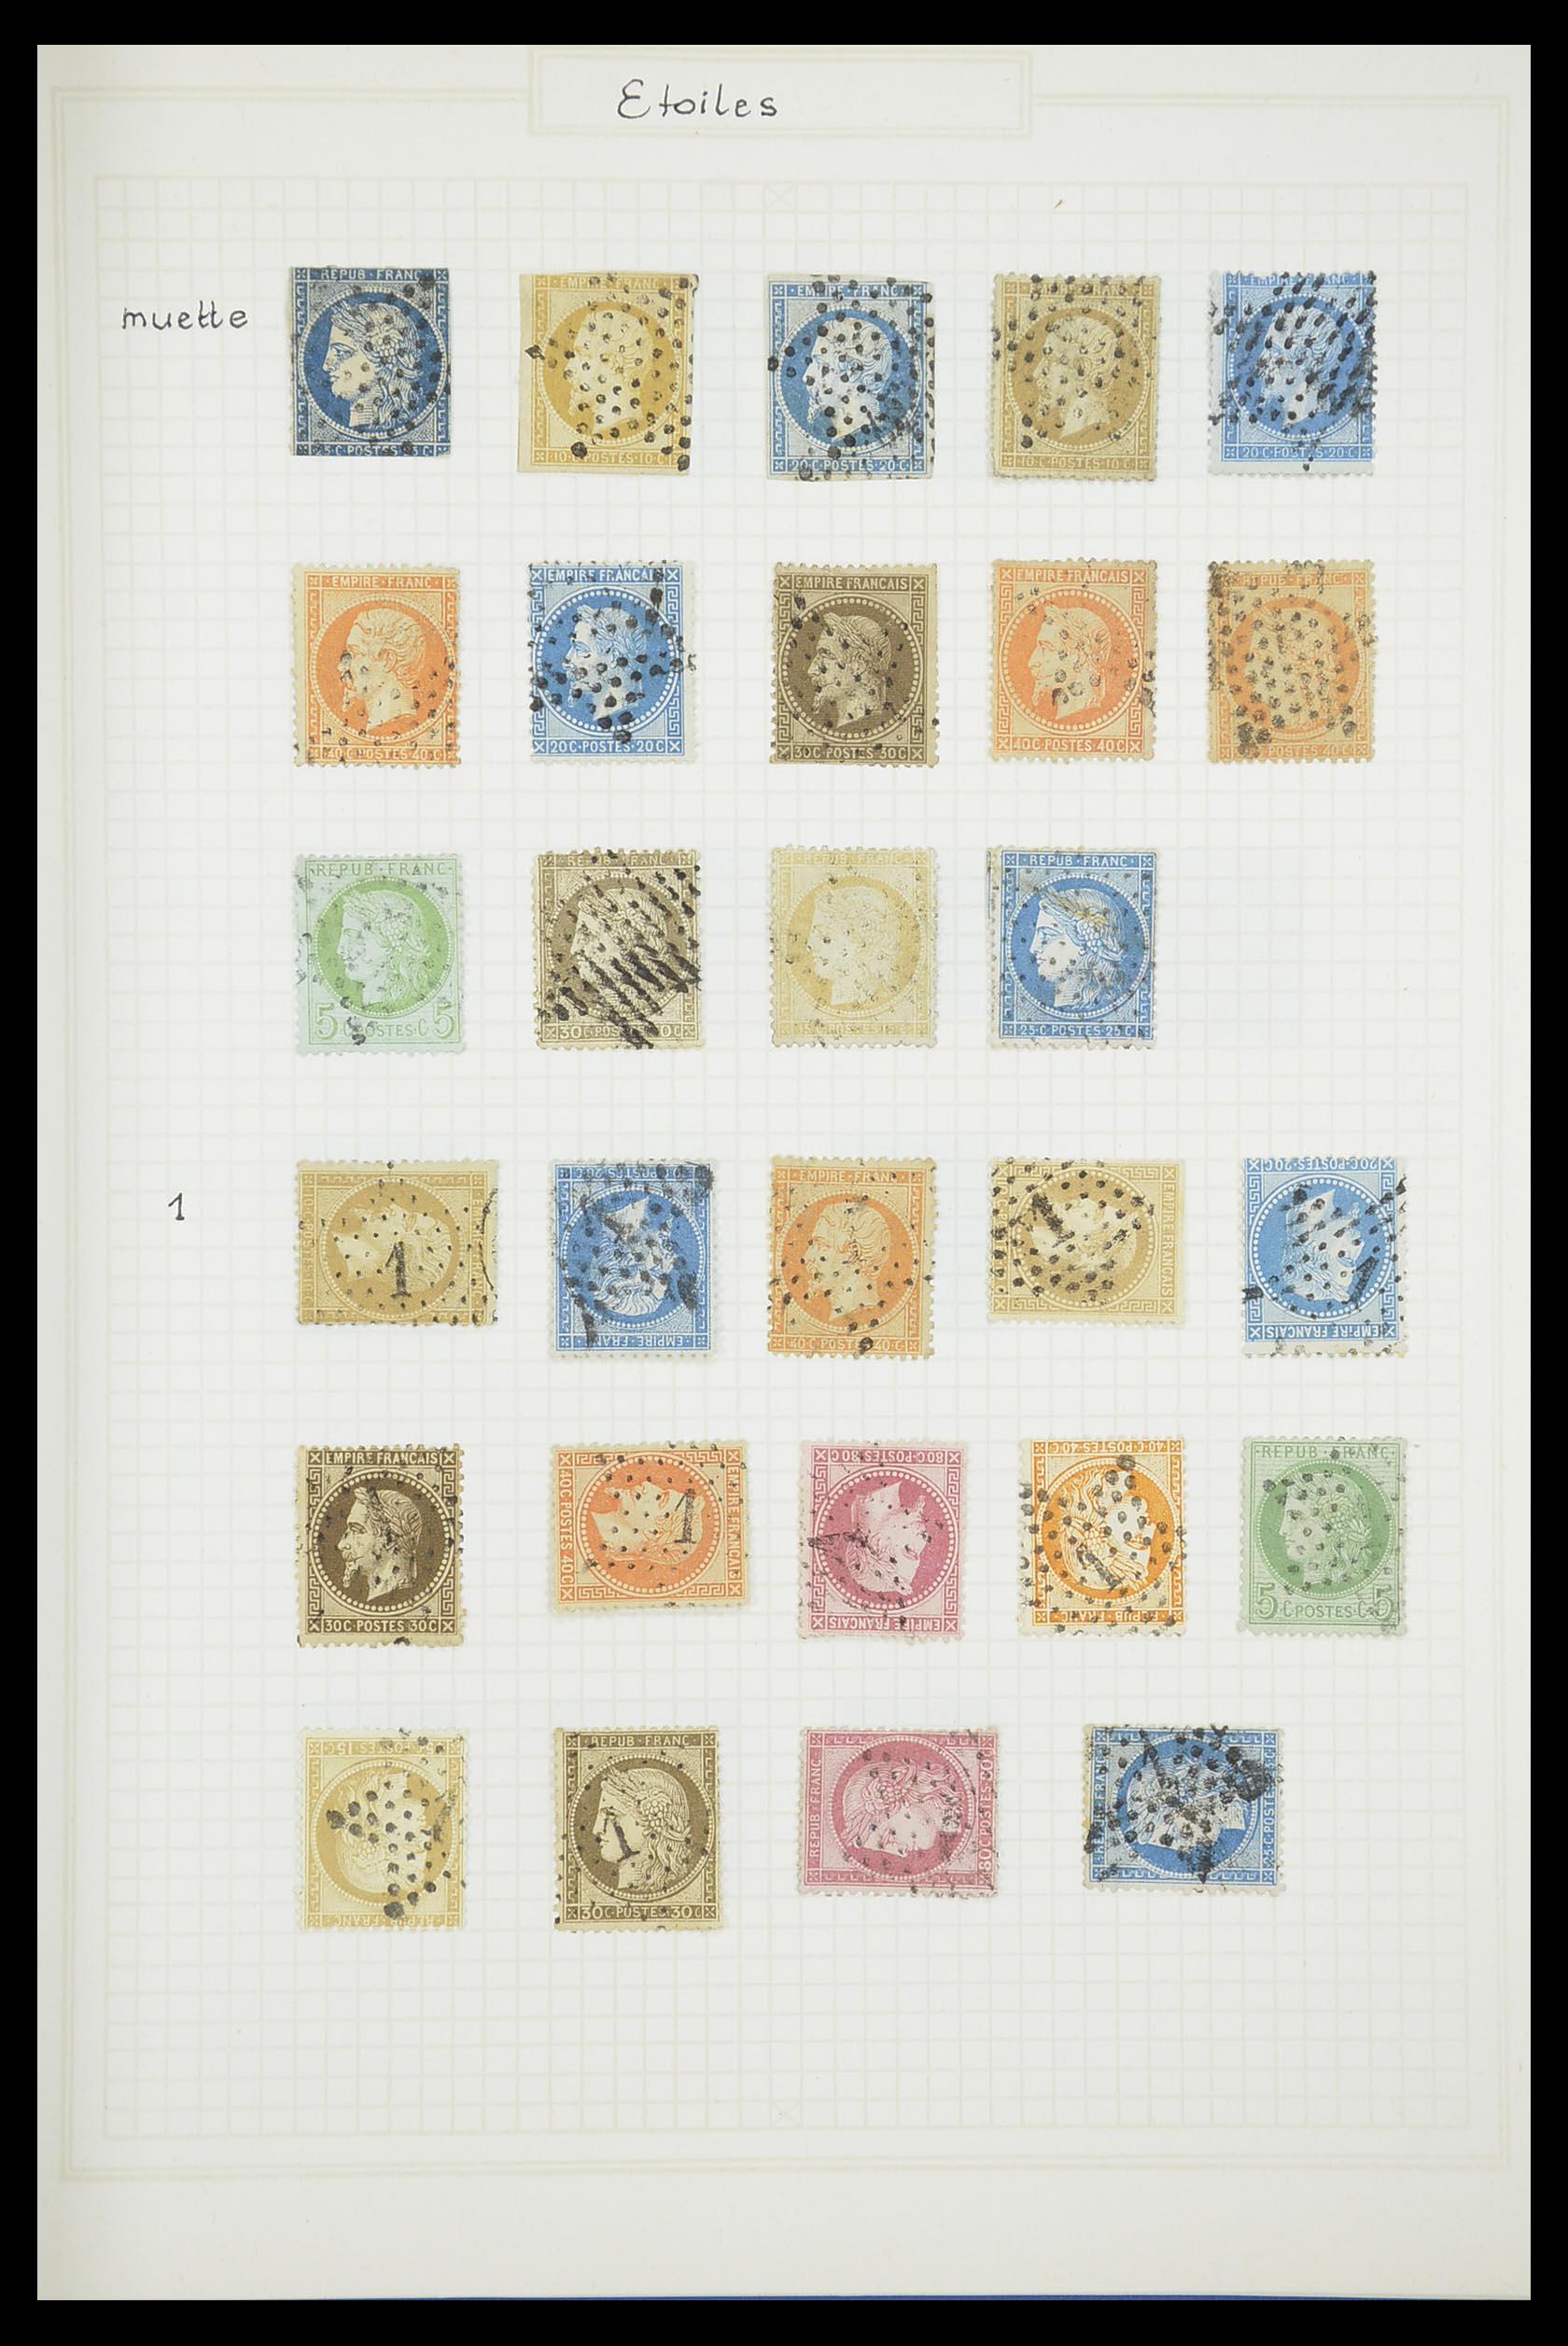 33851 001 - Postzegelverzameling 33851 Frankrijk klassiek stempels.